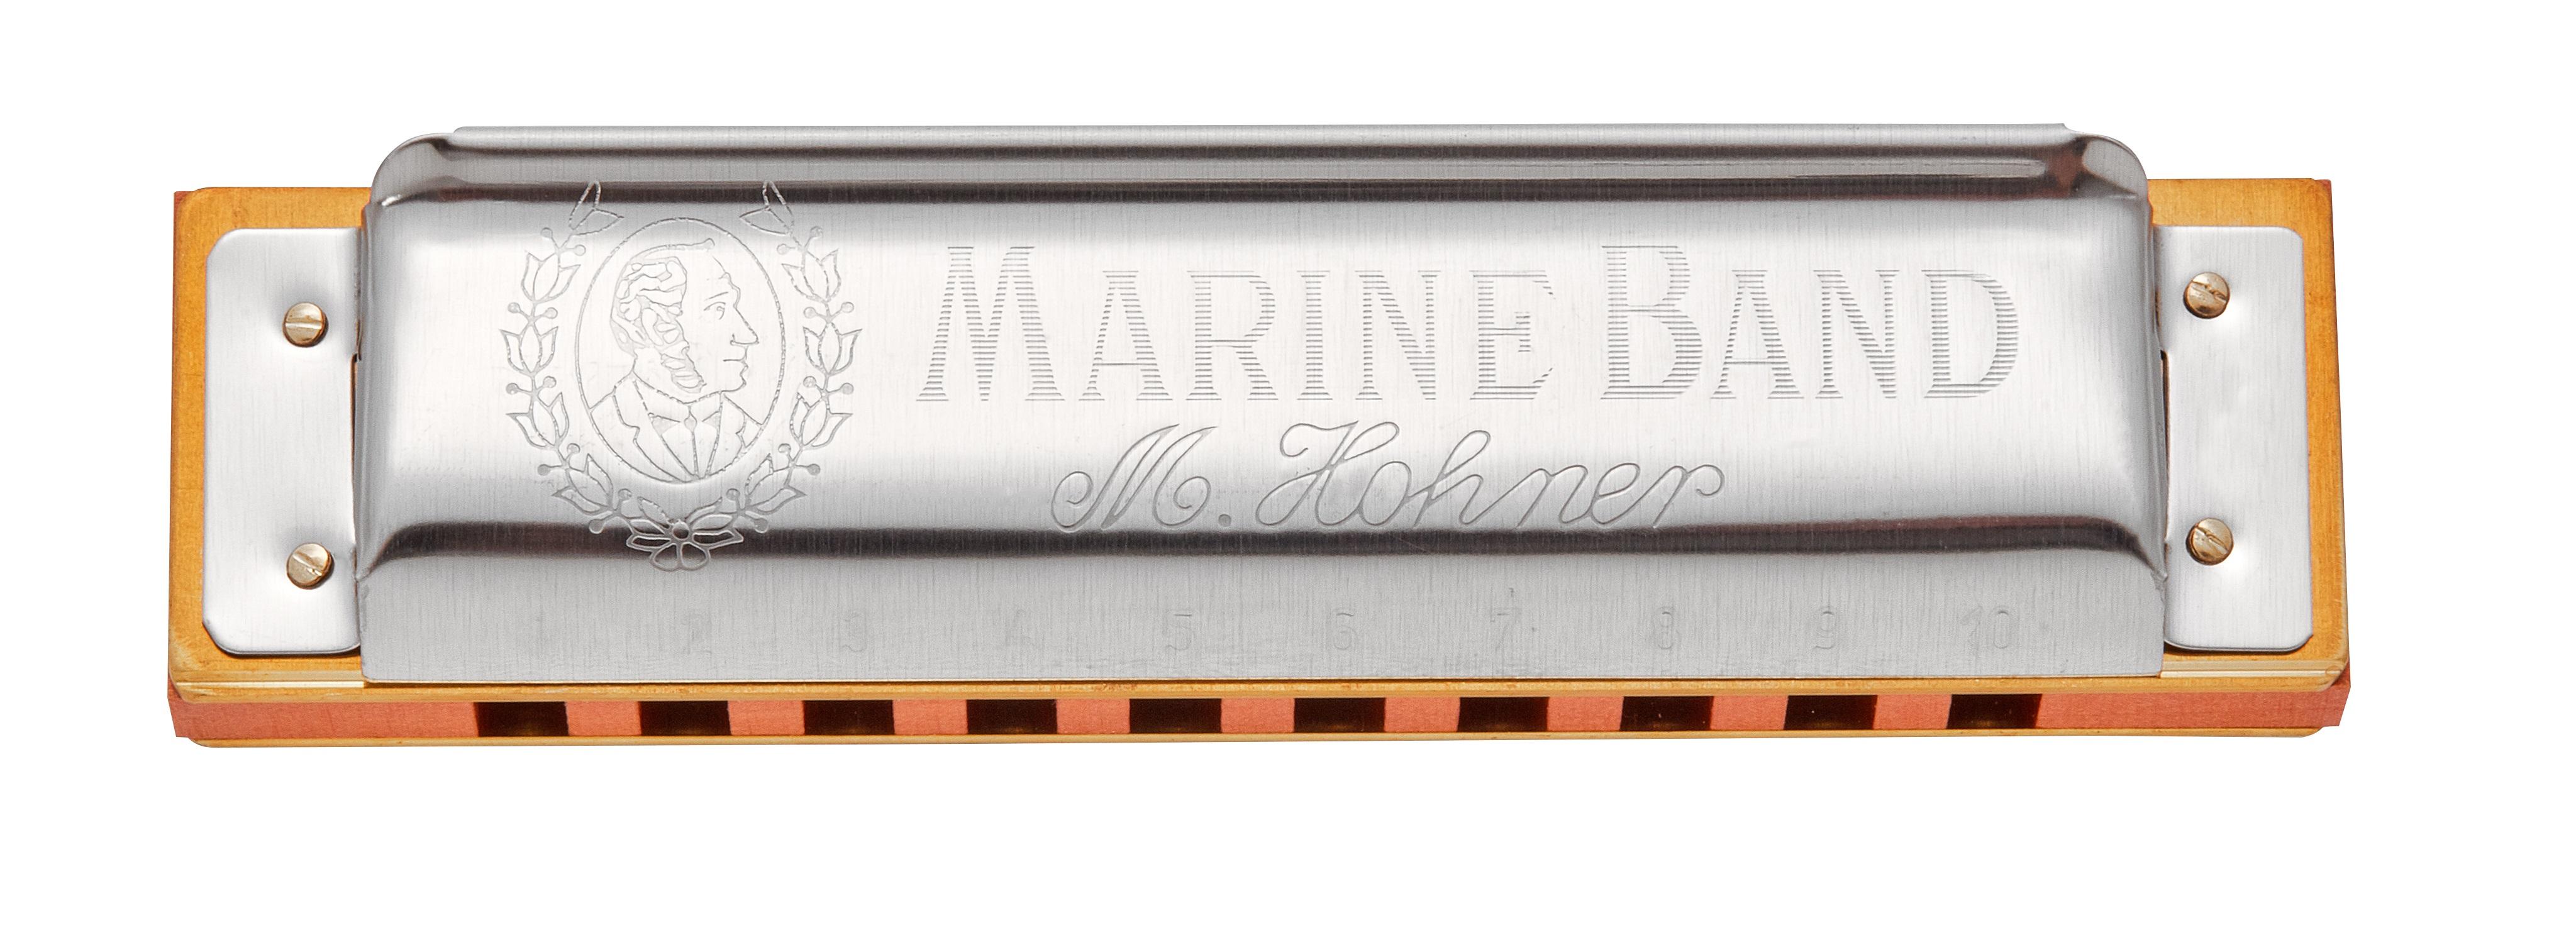 Hohner Marine Band 1896 F#-major